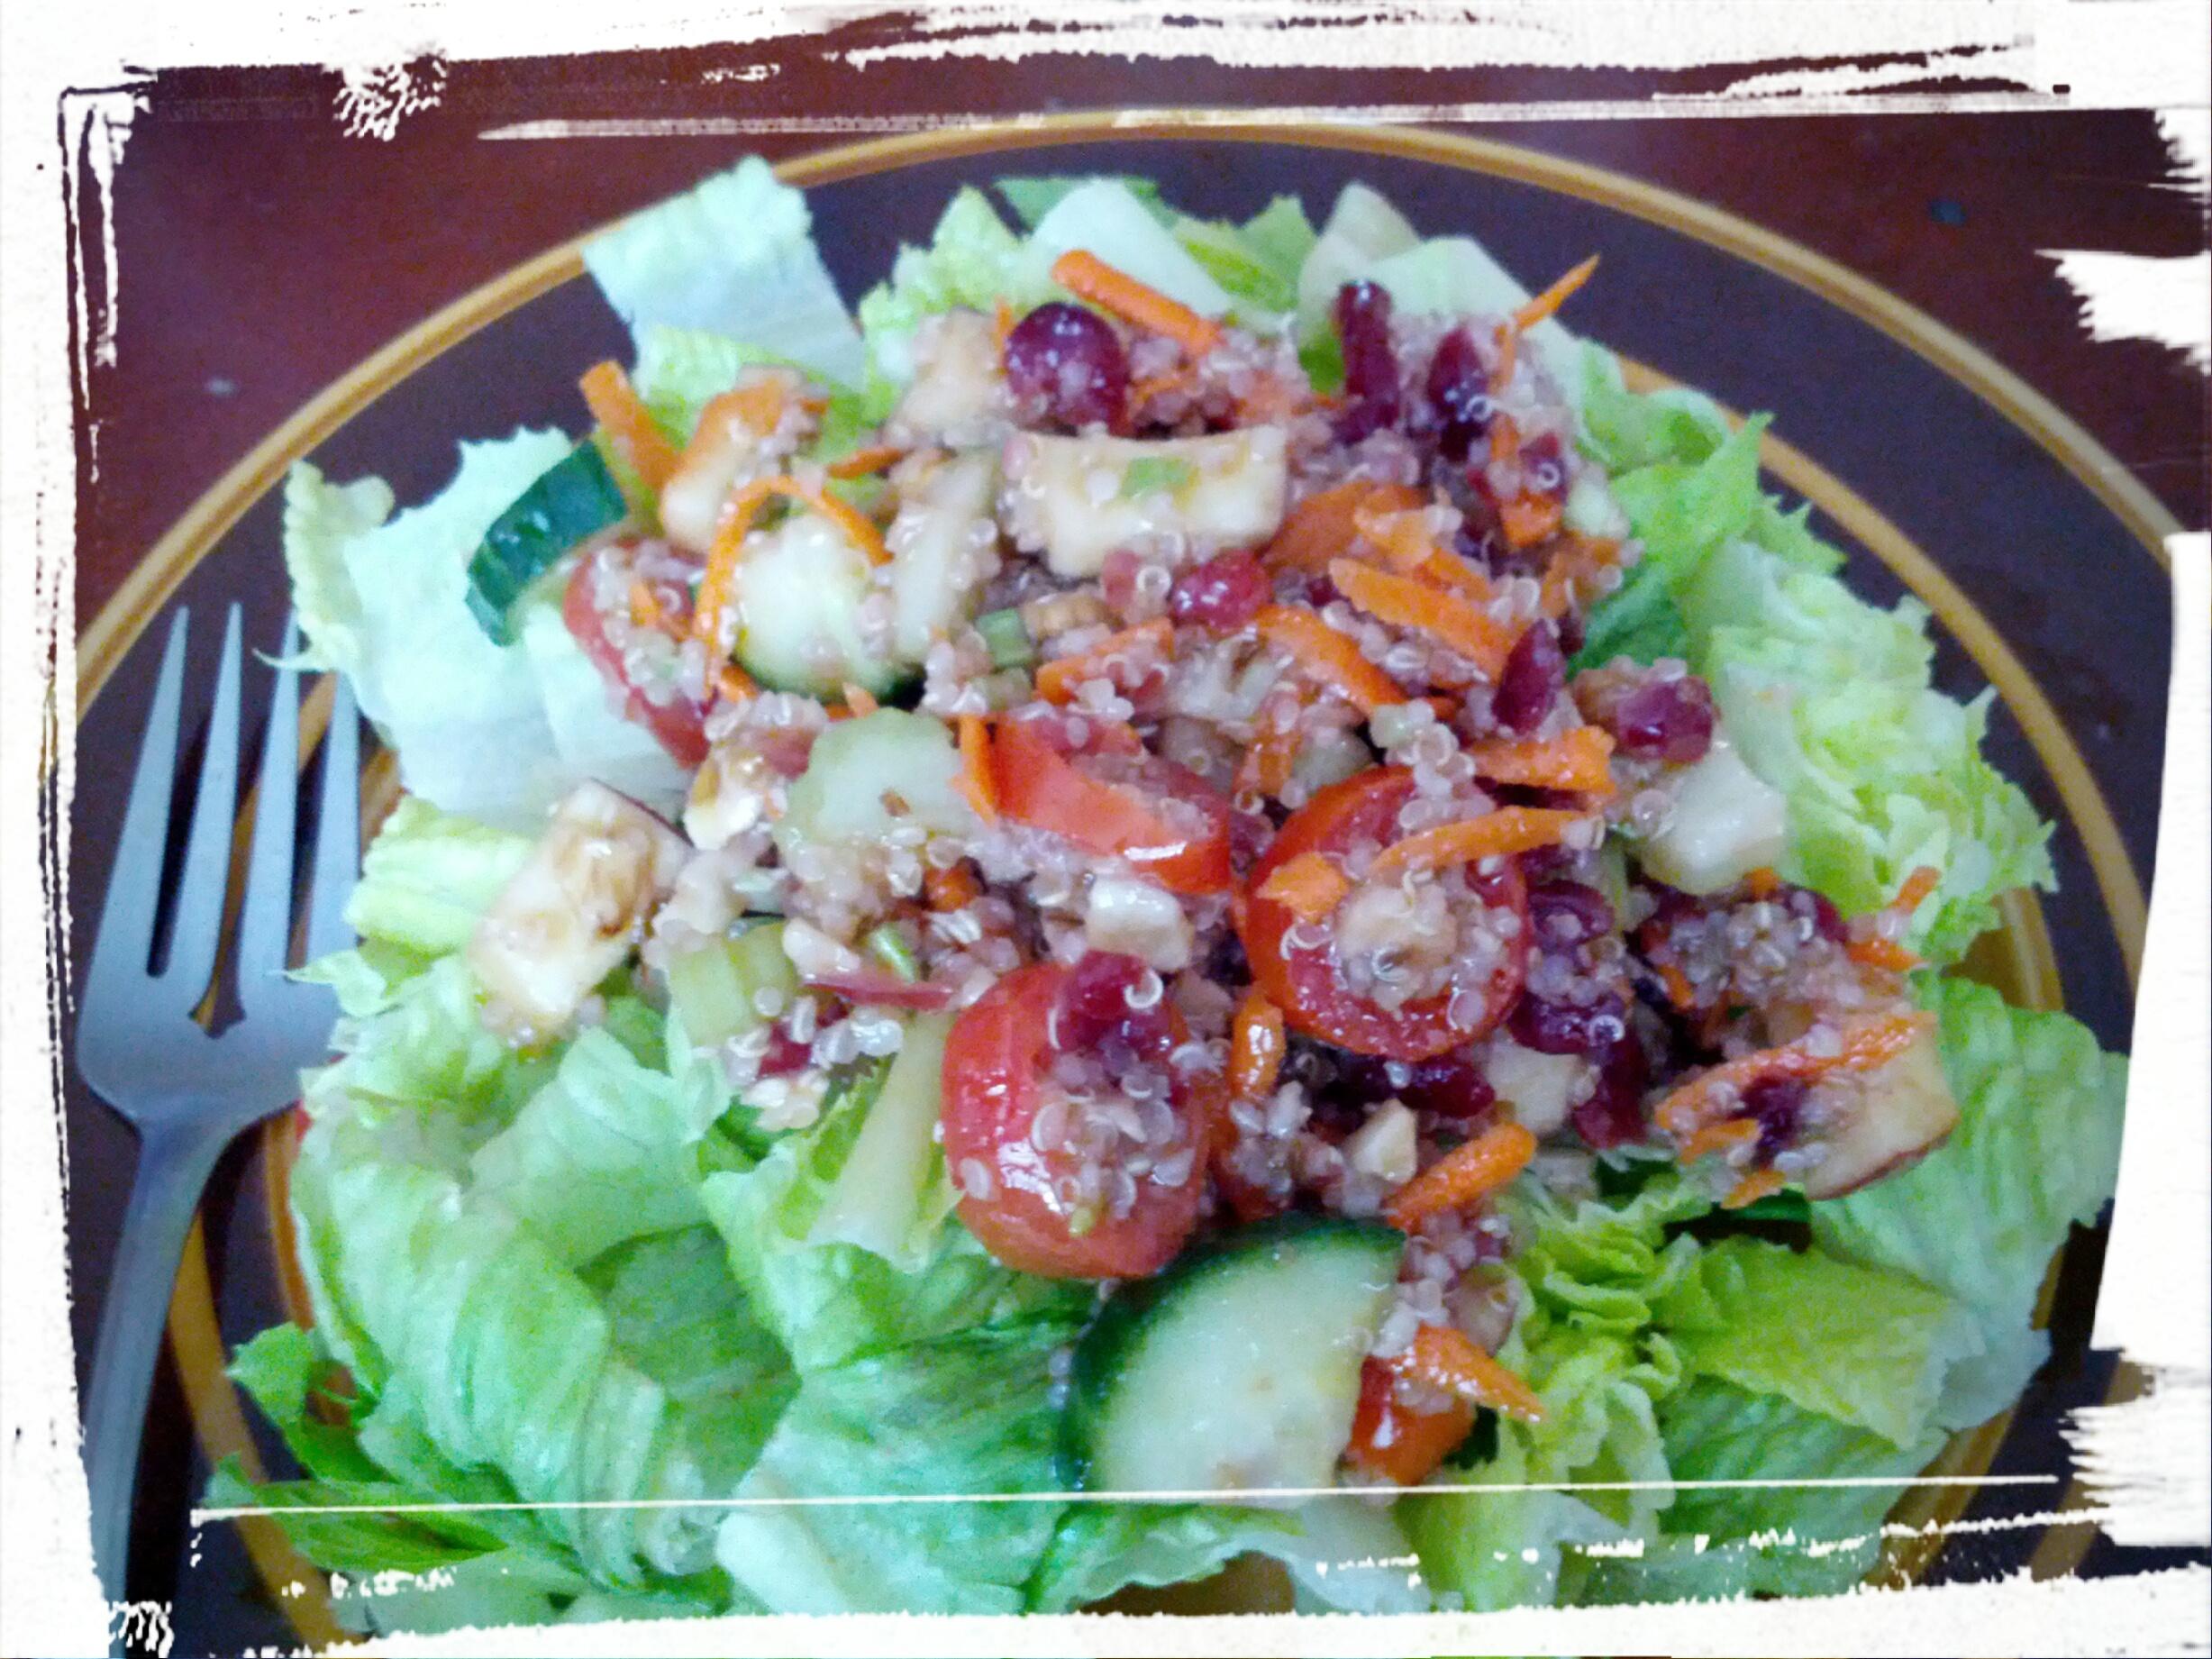 Picture of Quinoa Crazy Healthy Salad